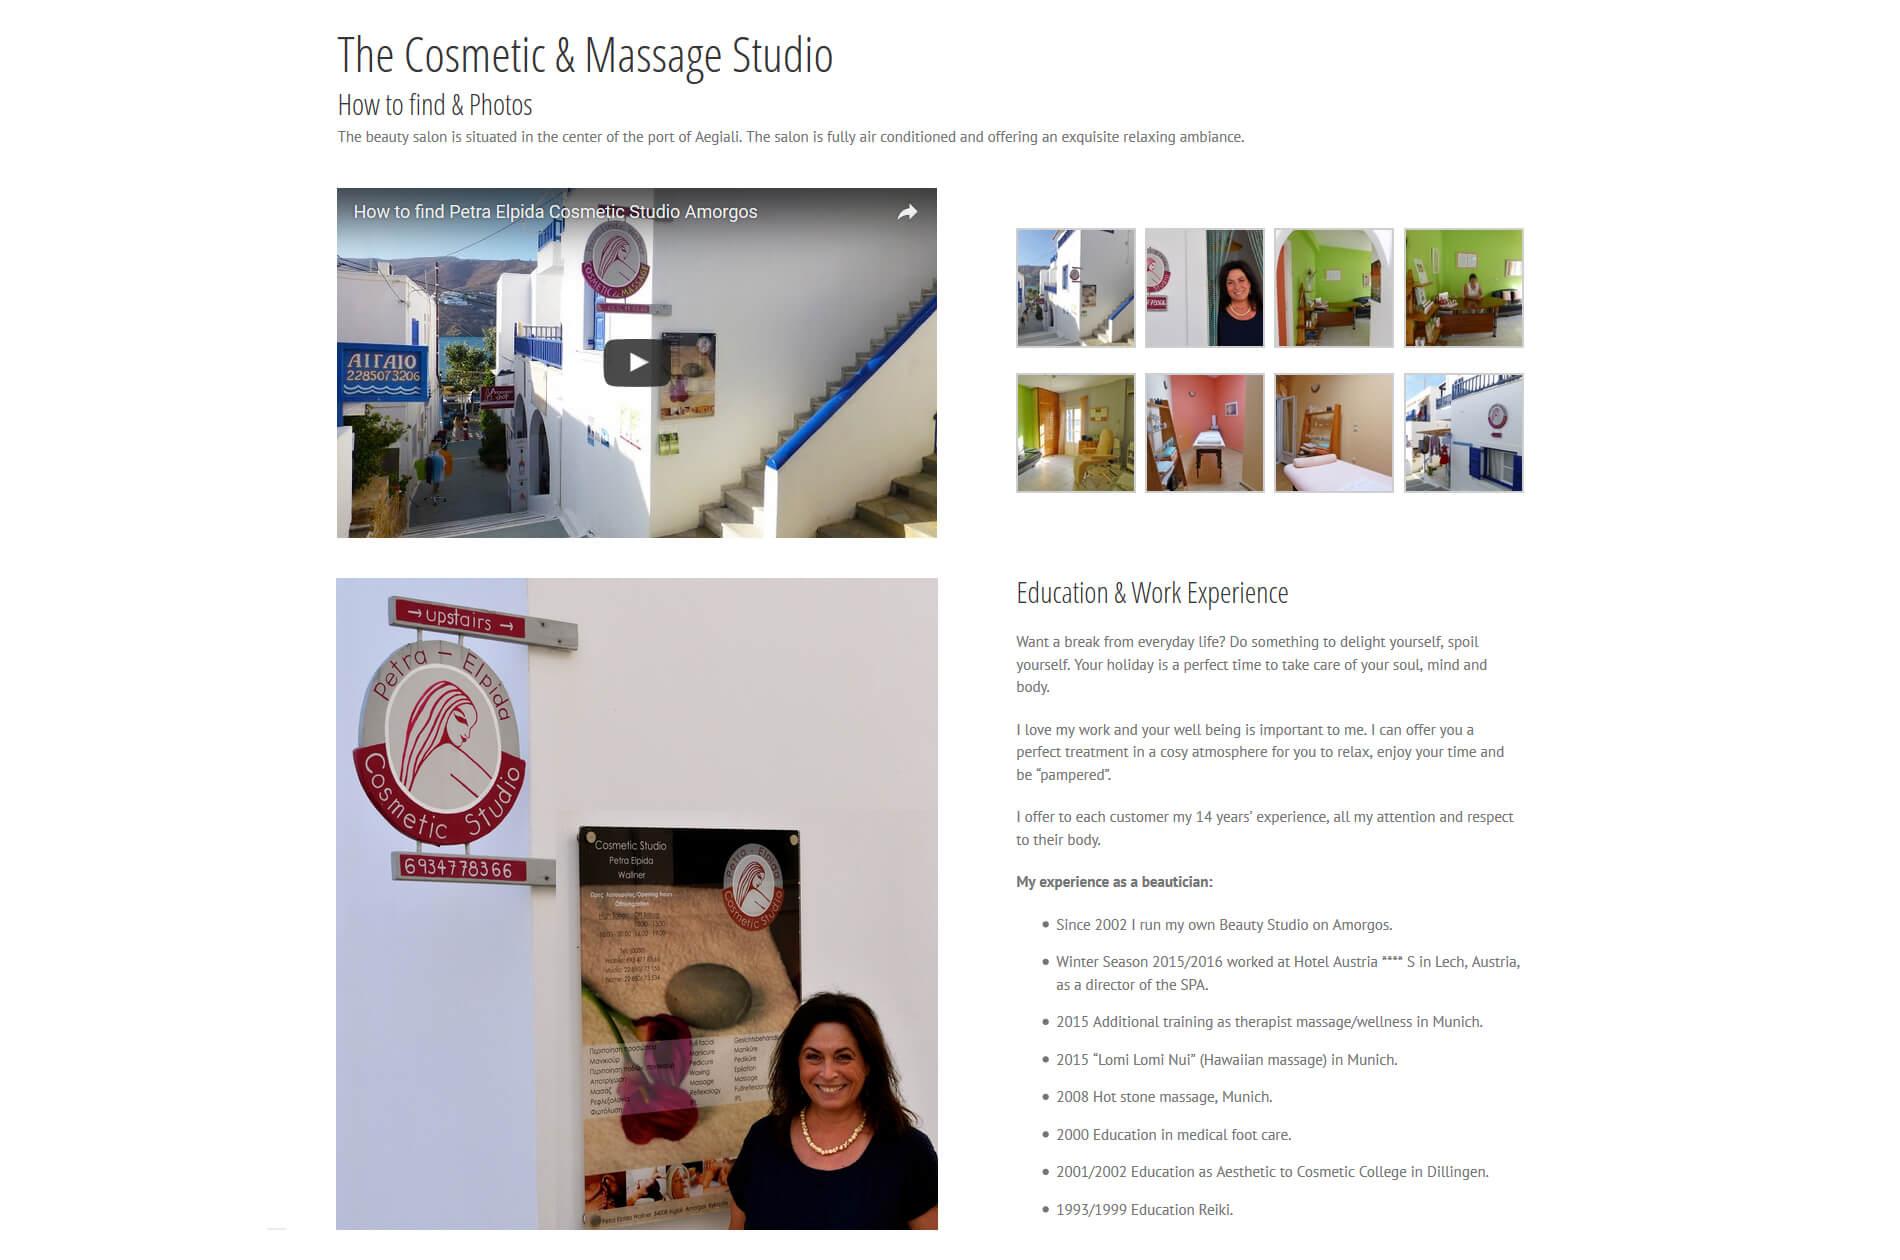 Webbdesign anweb Petra Elpida Cosmetic & Massage Studio Amorgos